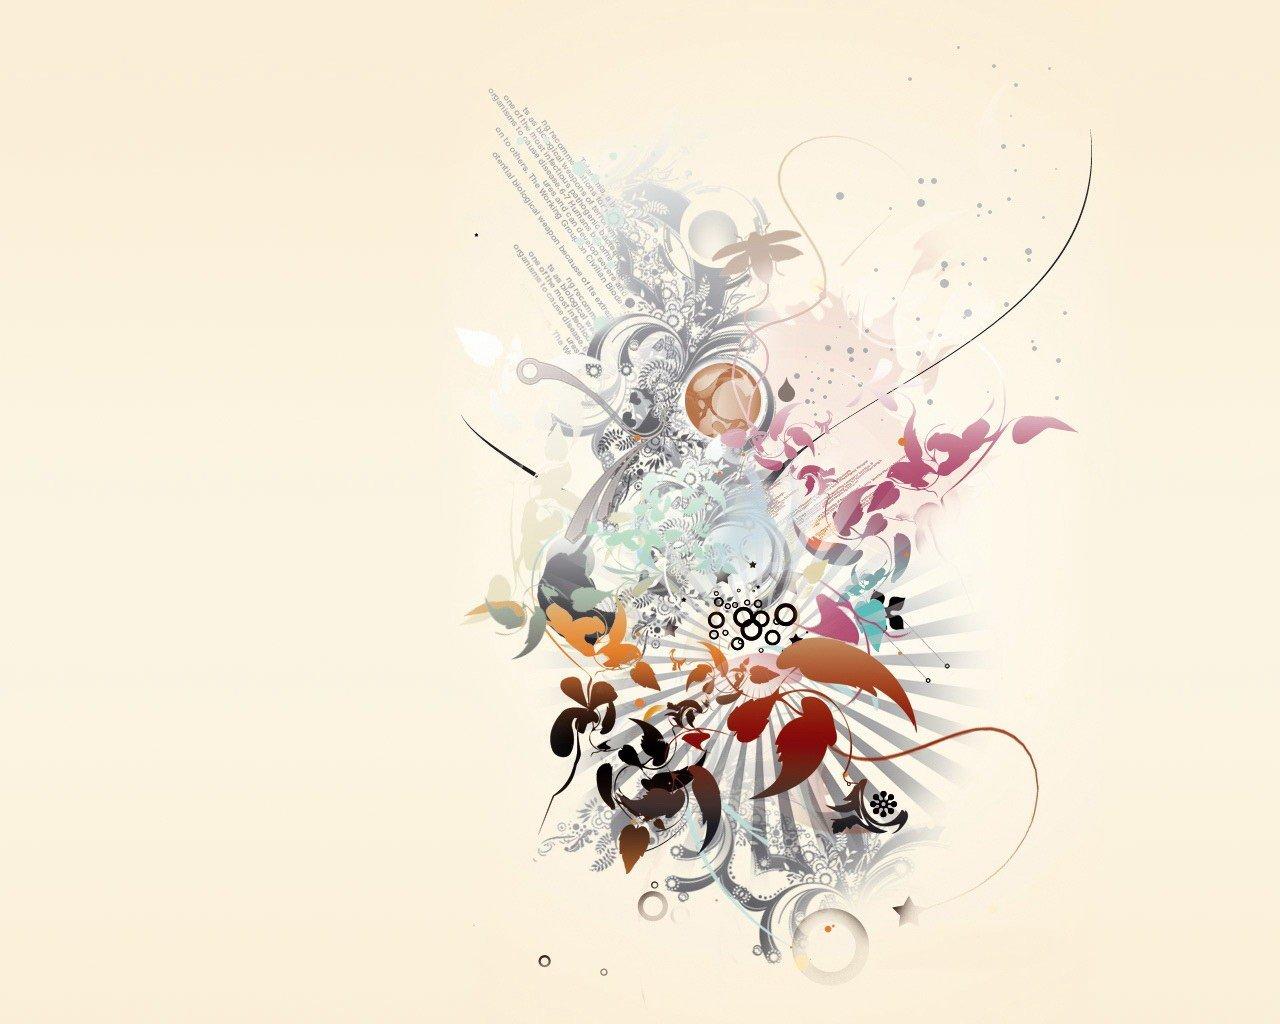 Креативная графика открытка, картинки